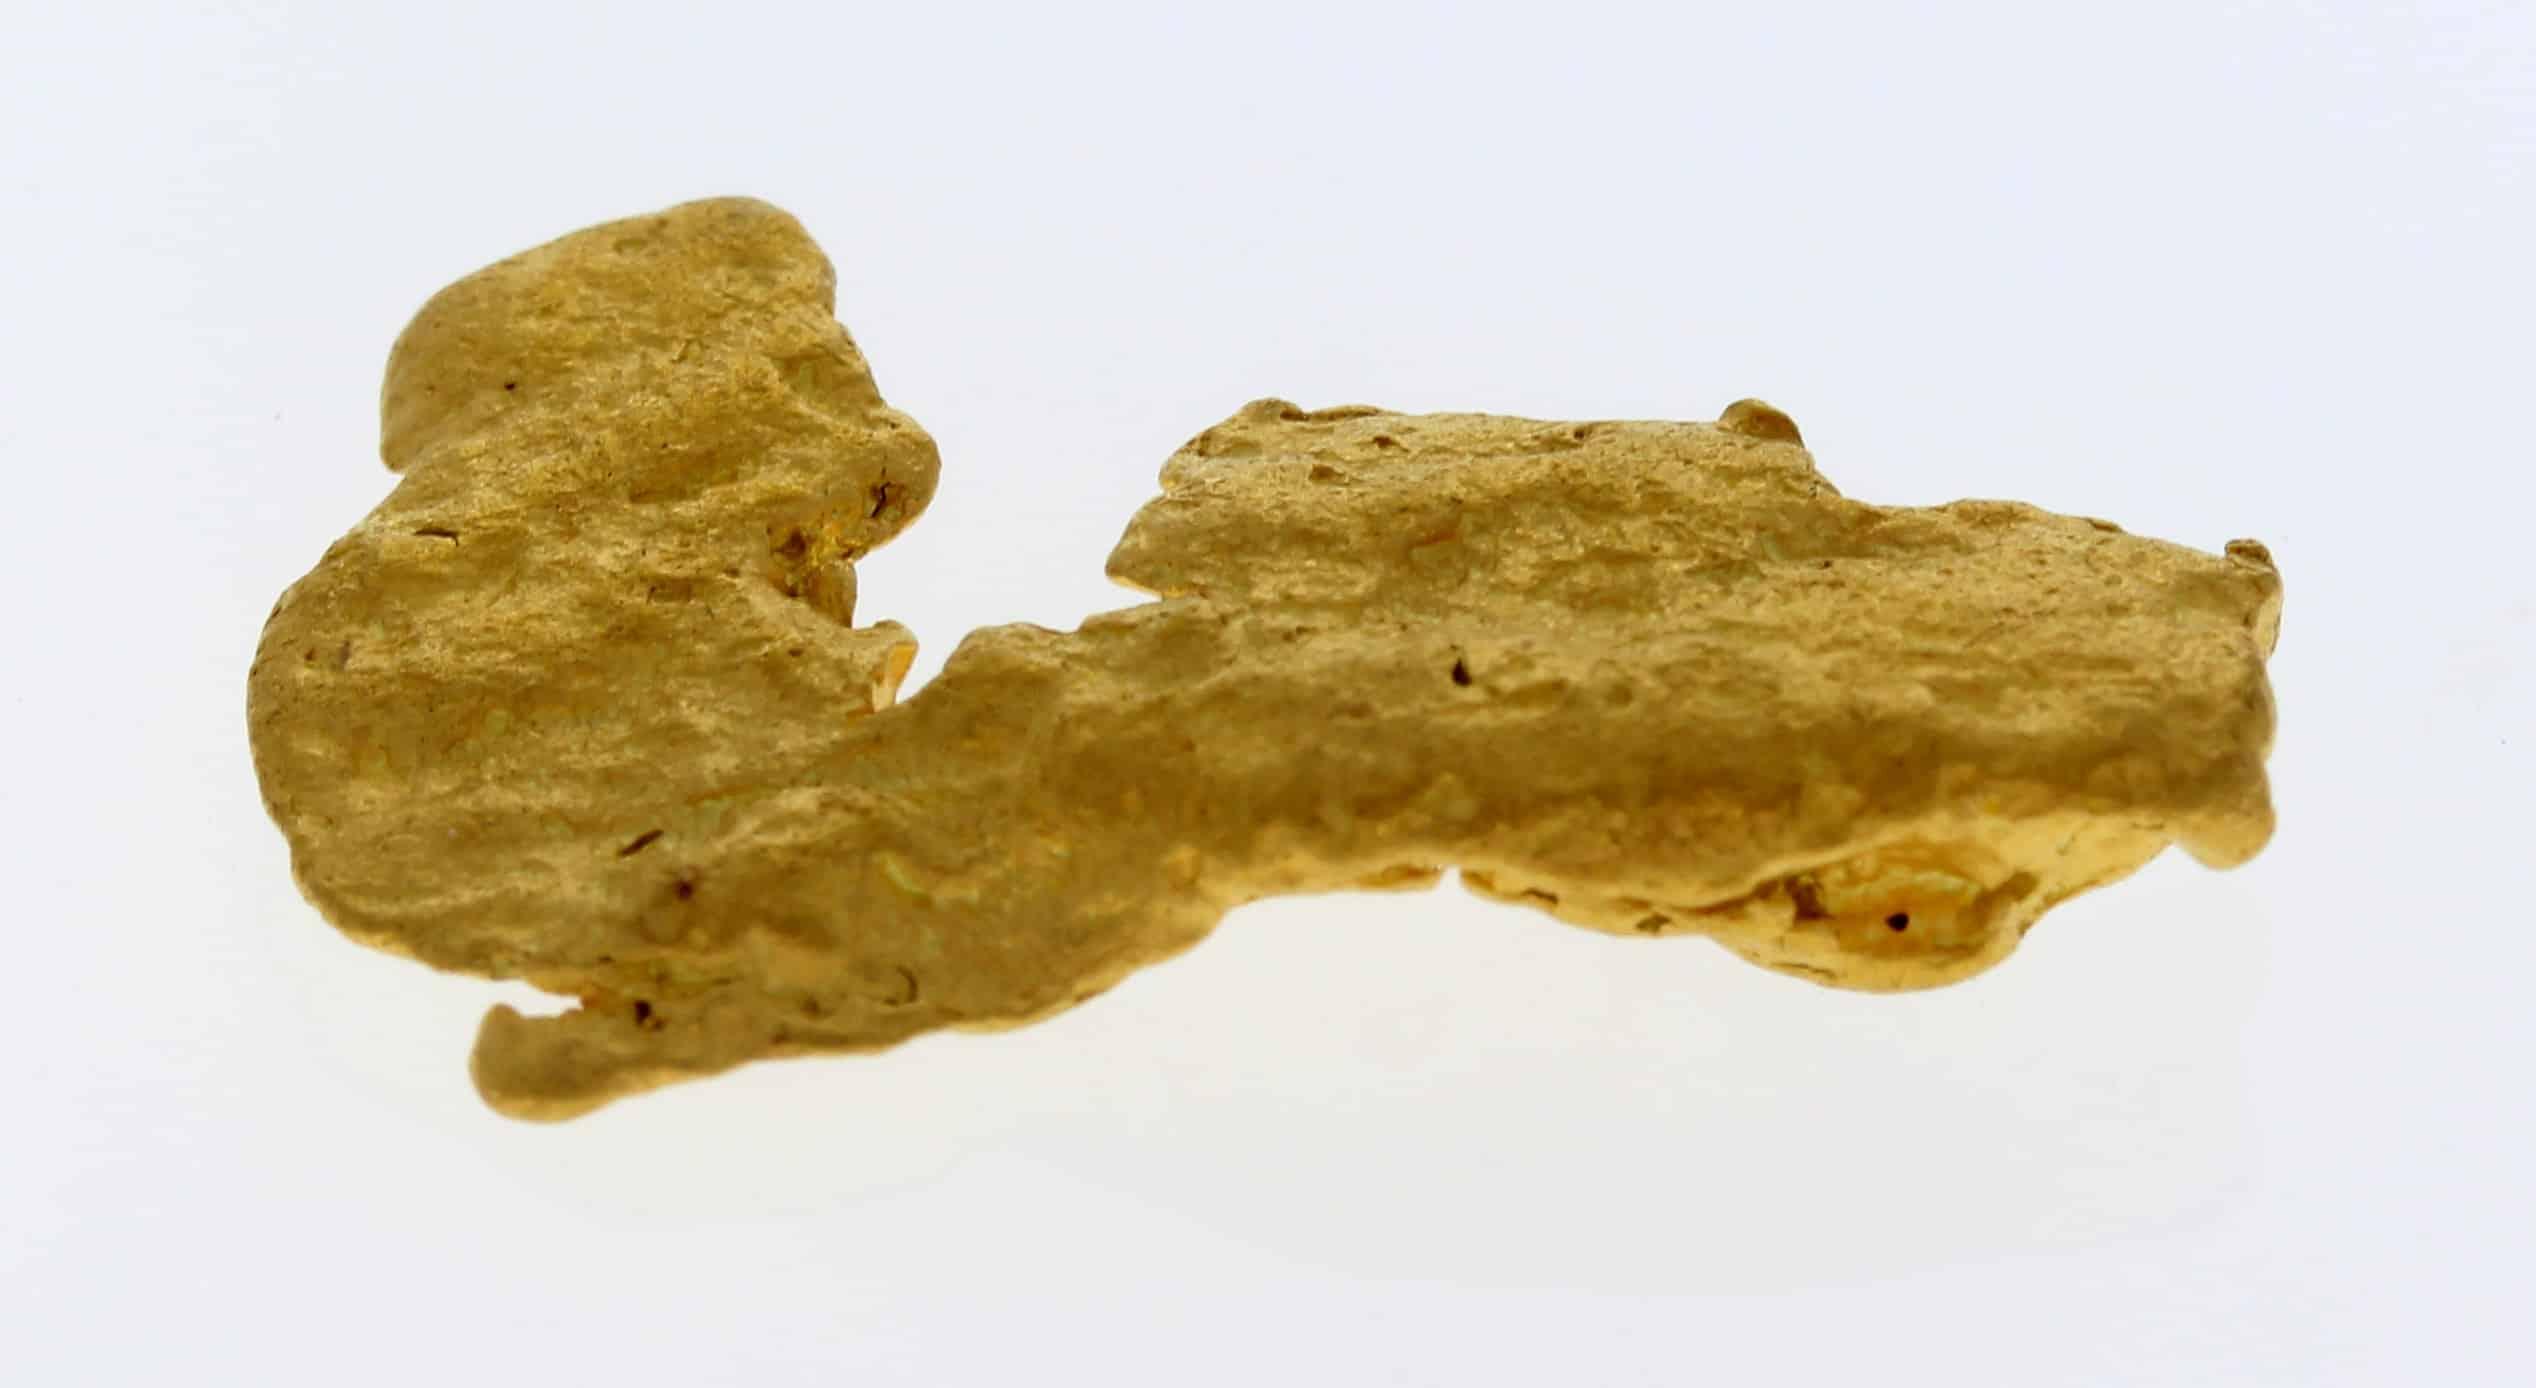 Natural Western Australian Gold Nugget - 4.75g 6